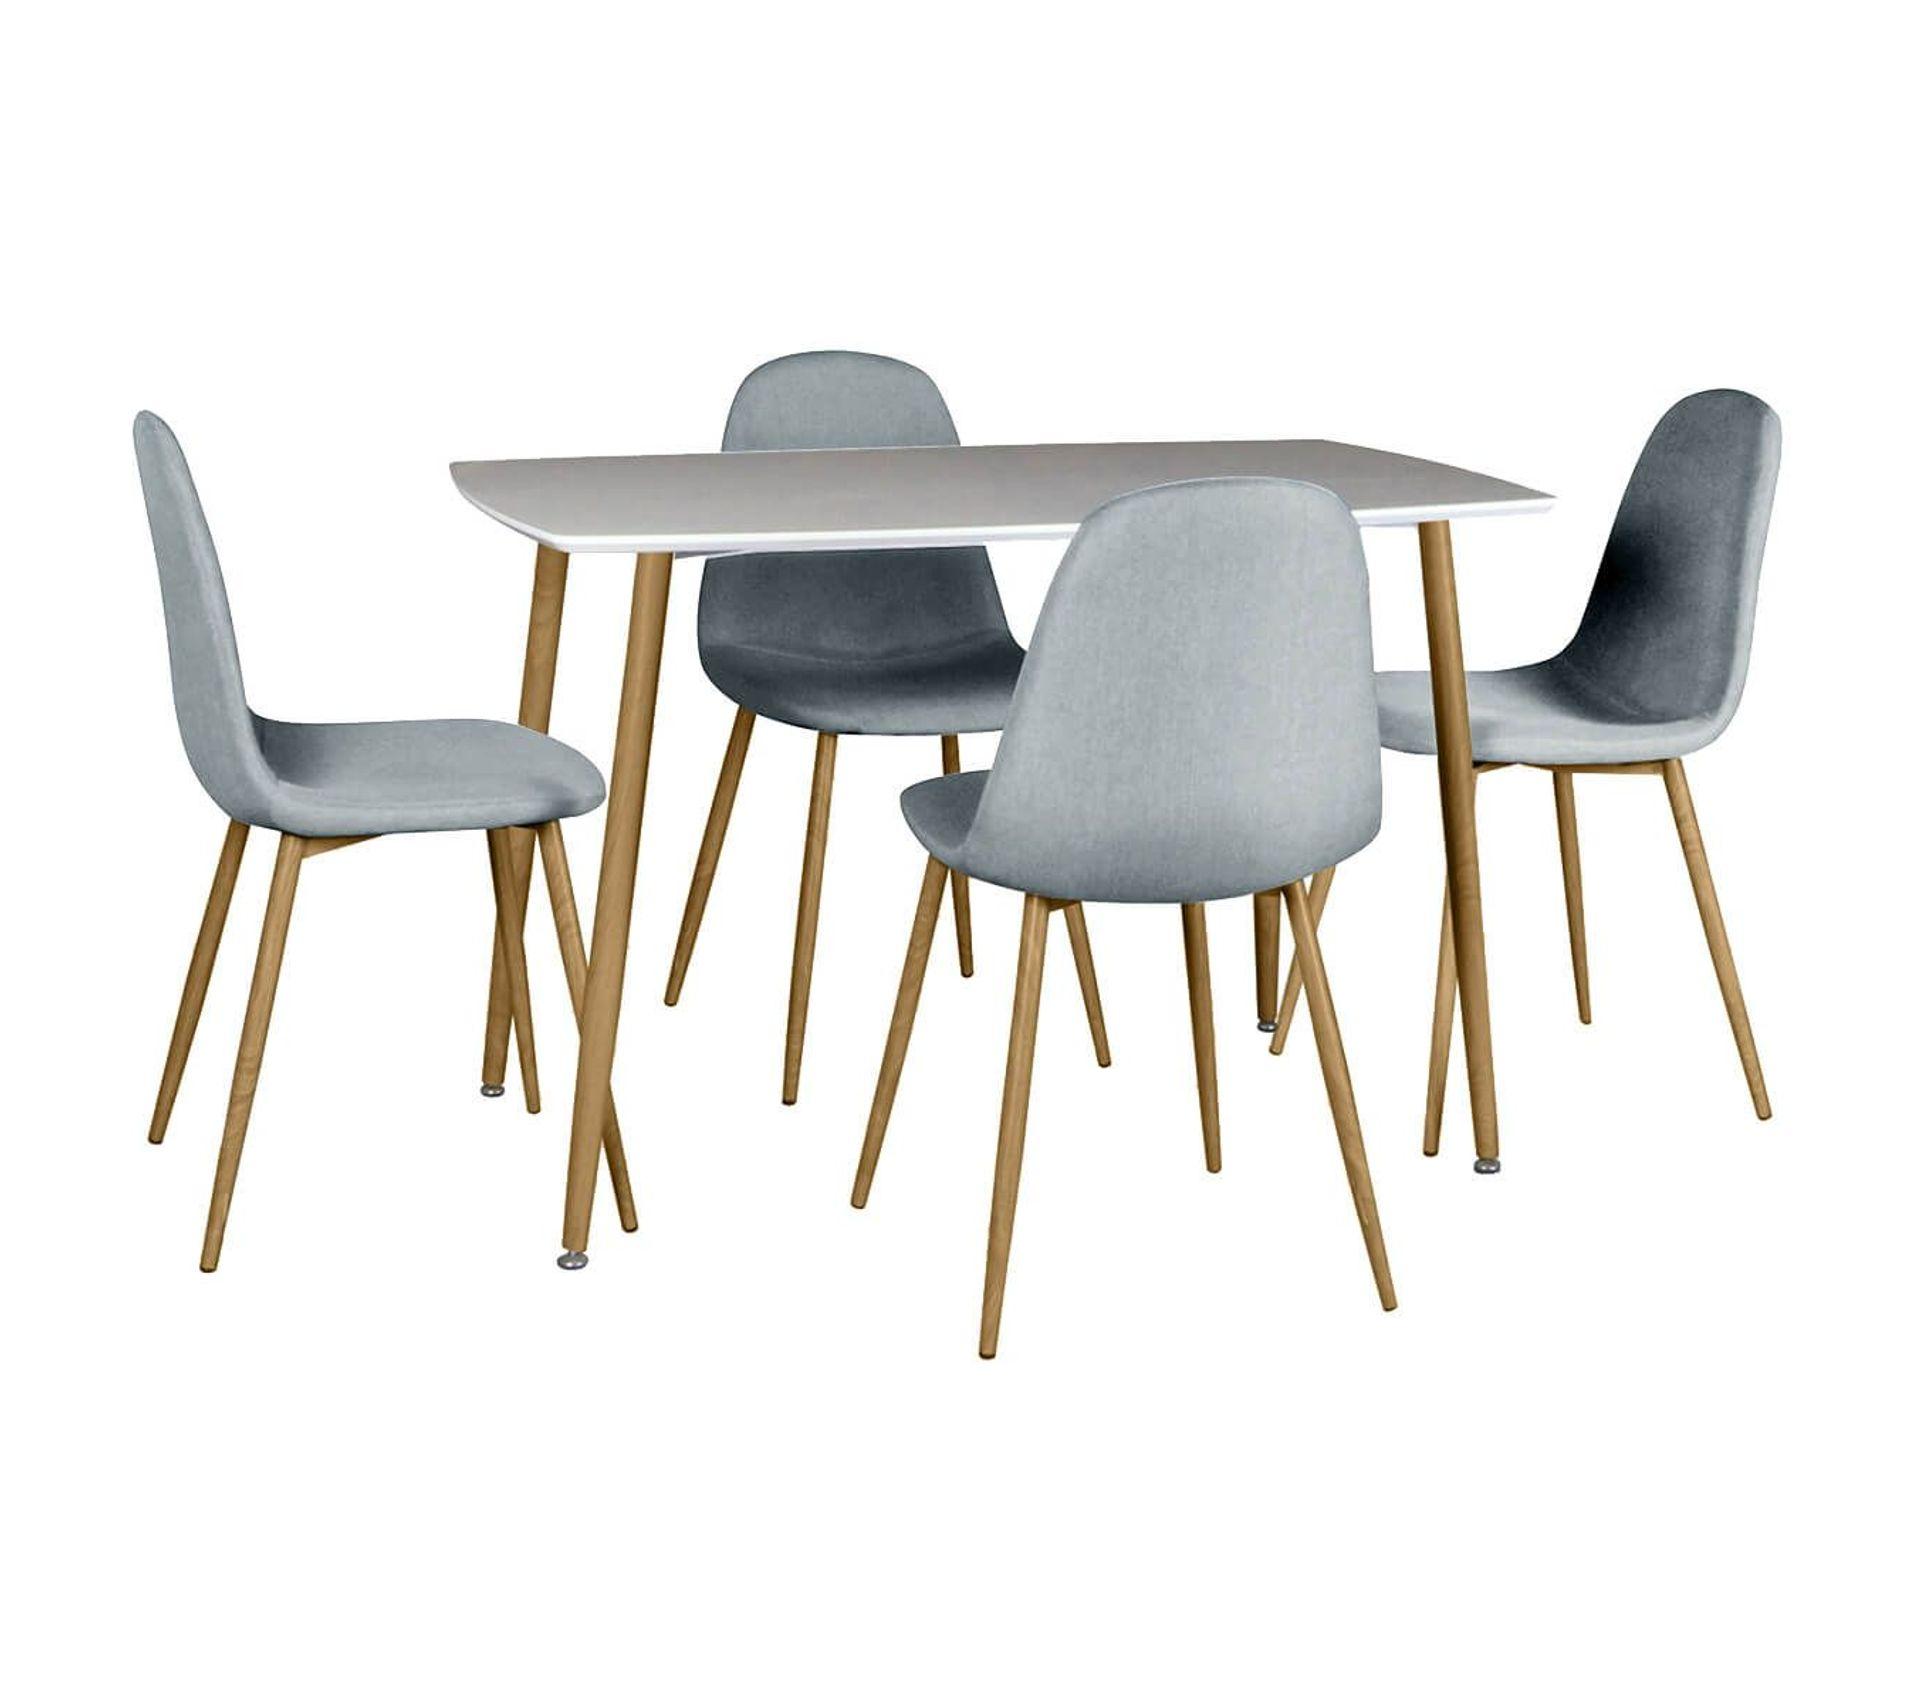 Ensemble Table + 6 Chaises Gris Clair - Winter